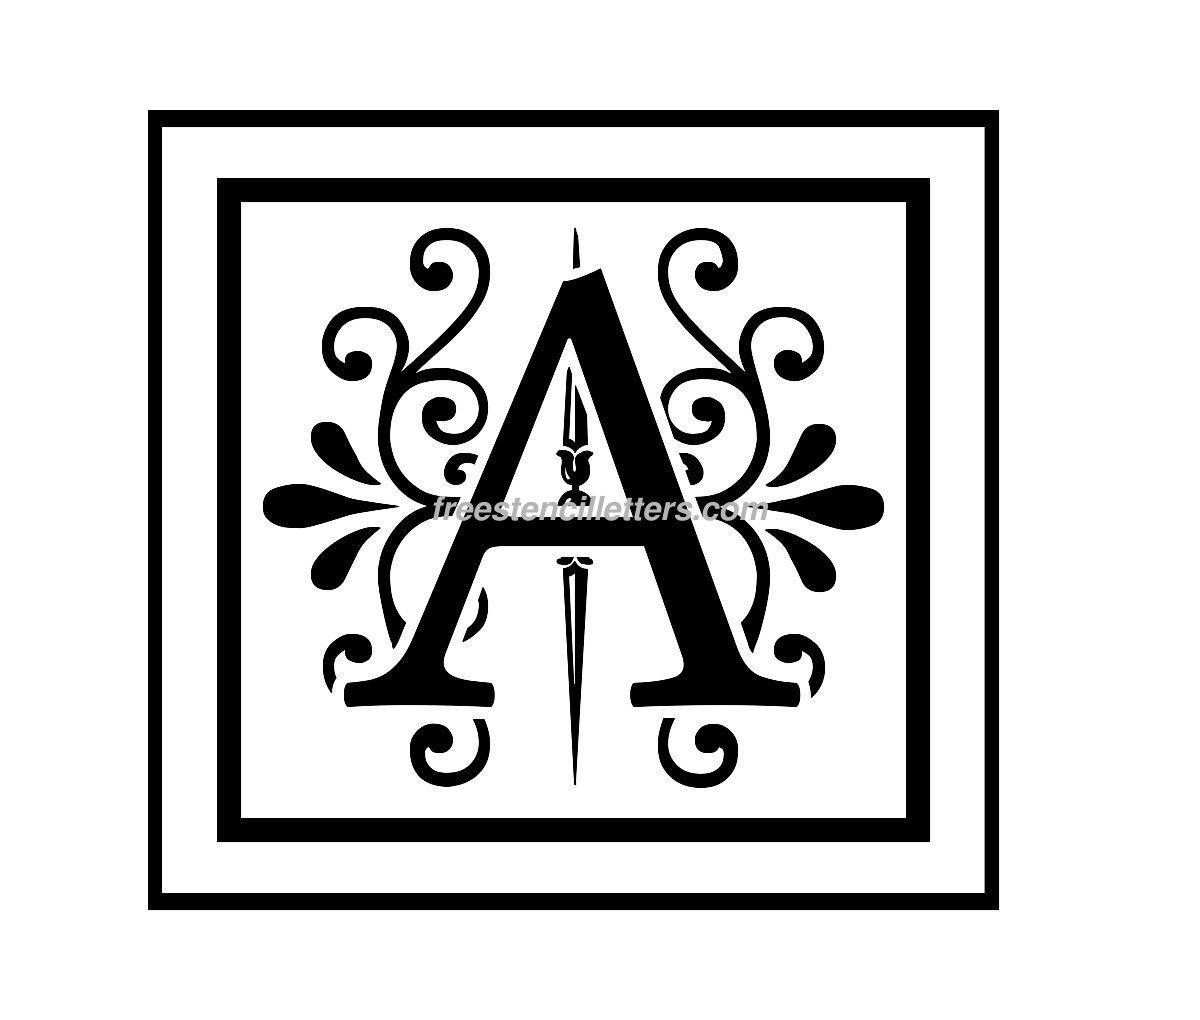 Print A Letter Stencil - Free Stencil Letters - Free Printable Monogram Letters